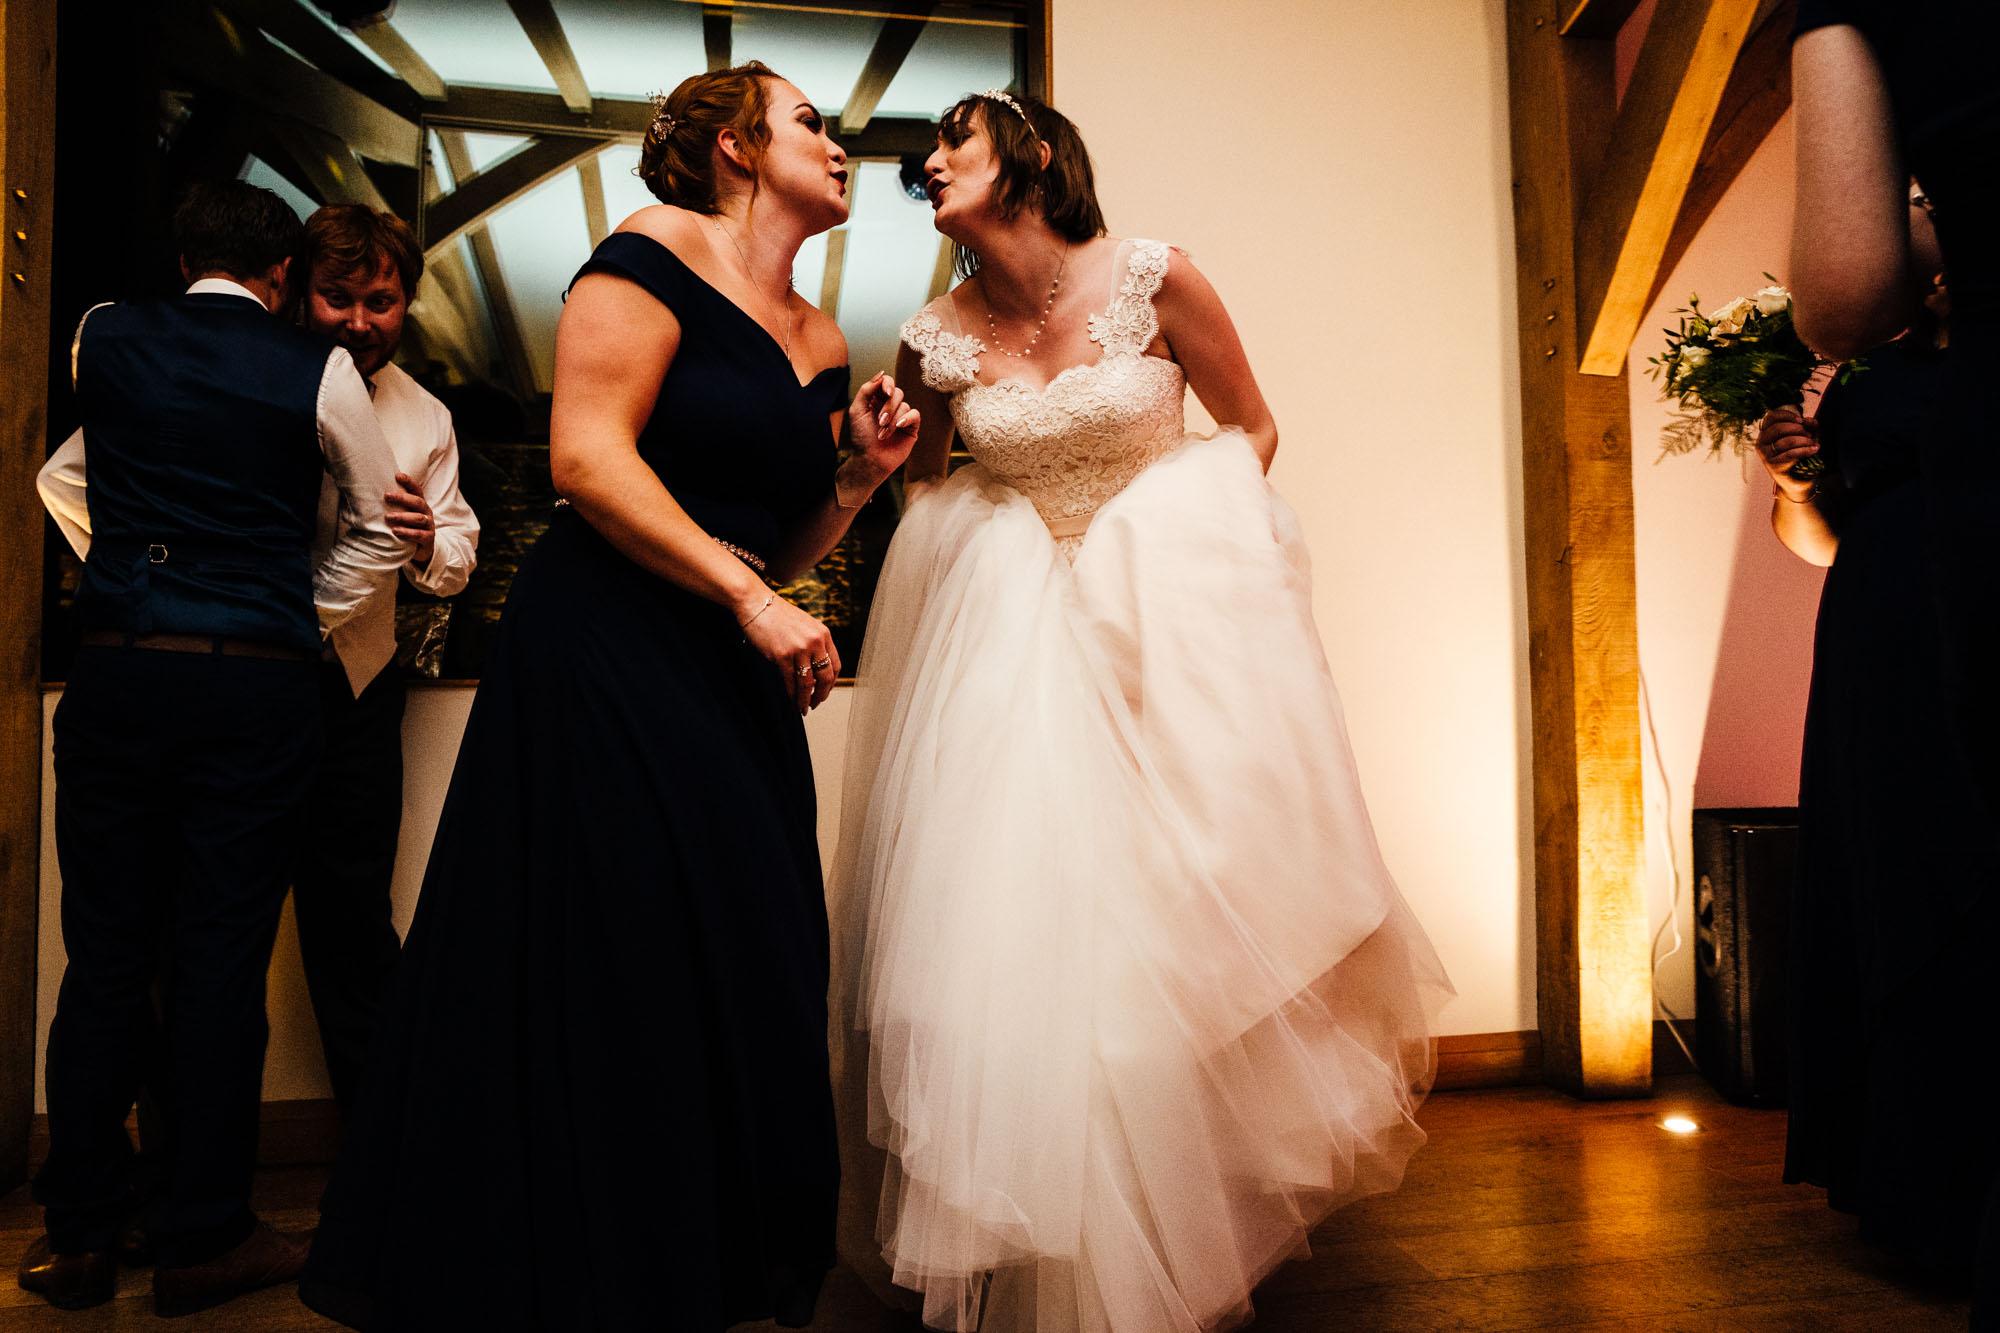 wedding-at-dodford-manor-87